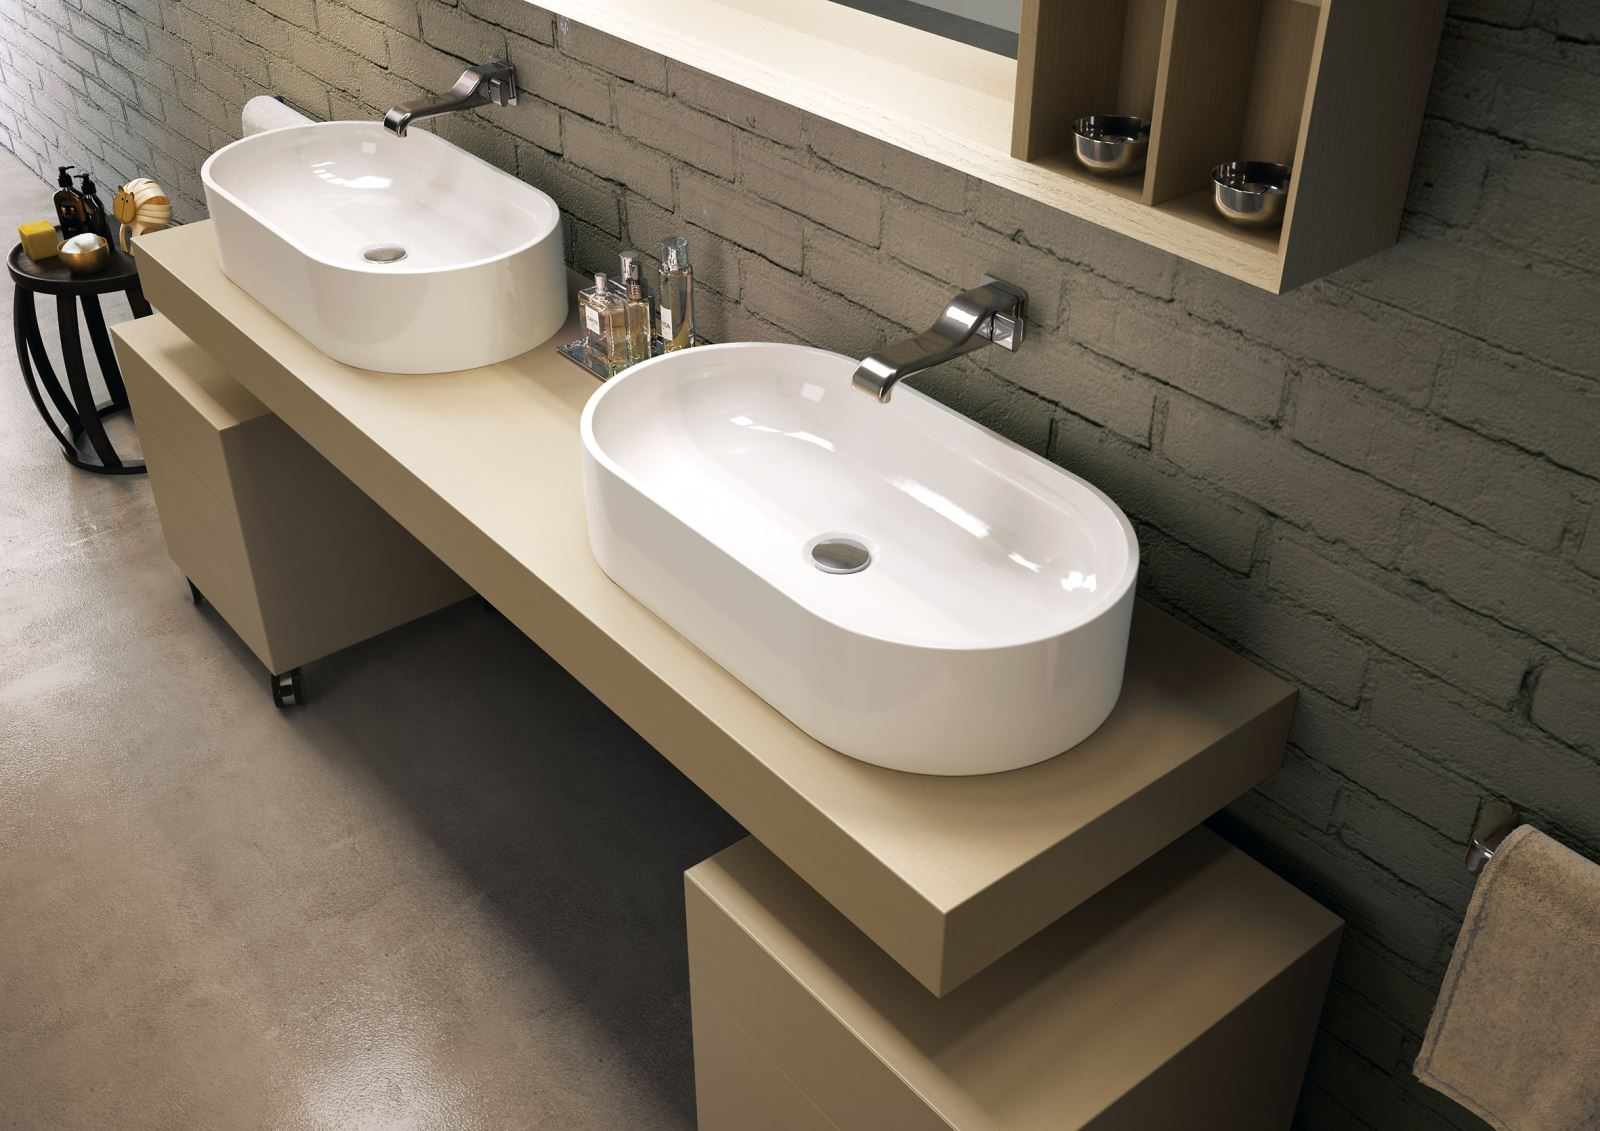 Vasca Da Bagno Flaminia Prezzi : Vasca da bagno in pietraluce wash by ceramica flaminia